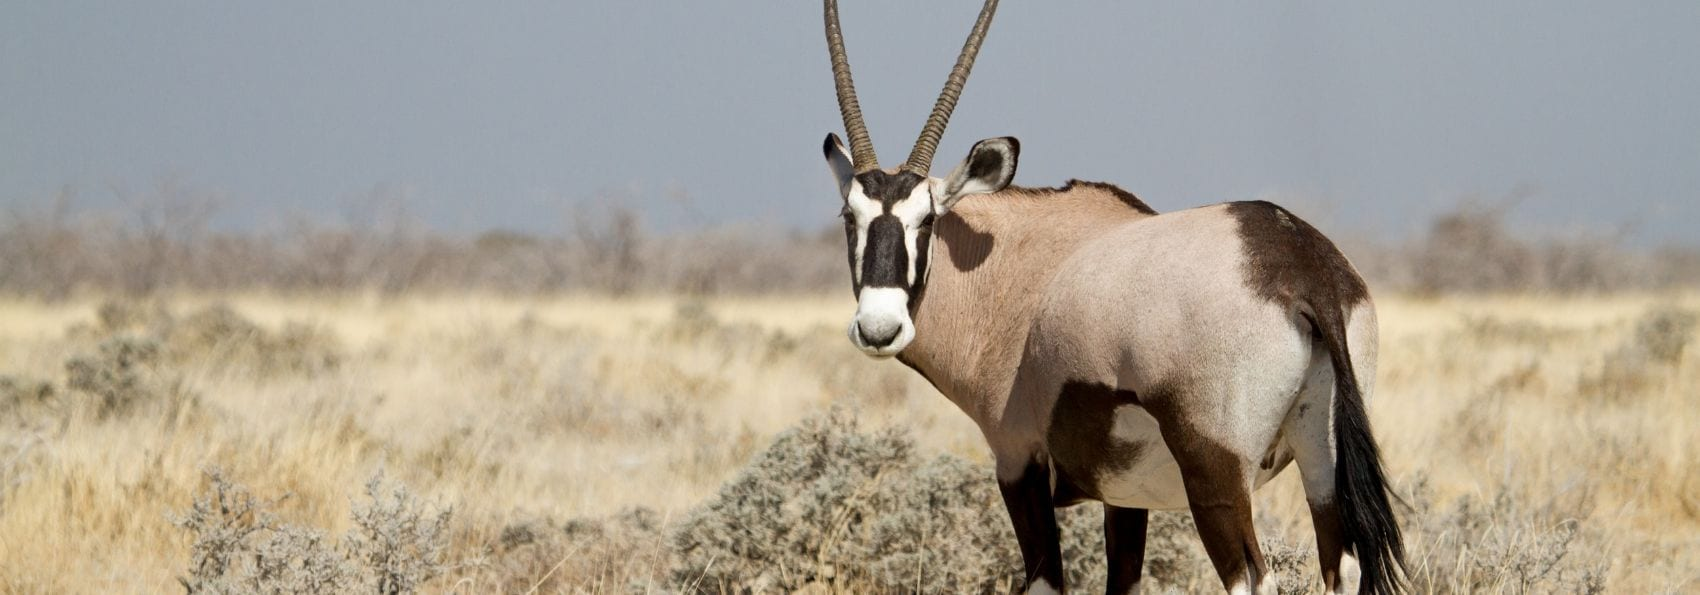 Aventure safari en Namibie